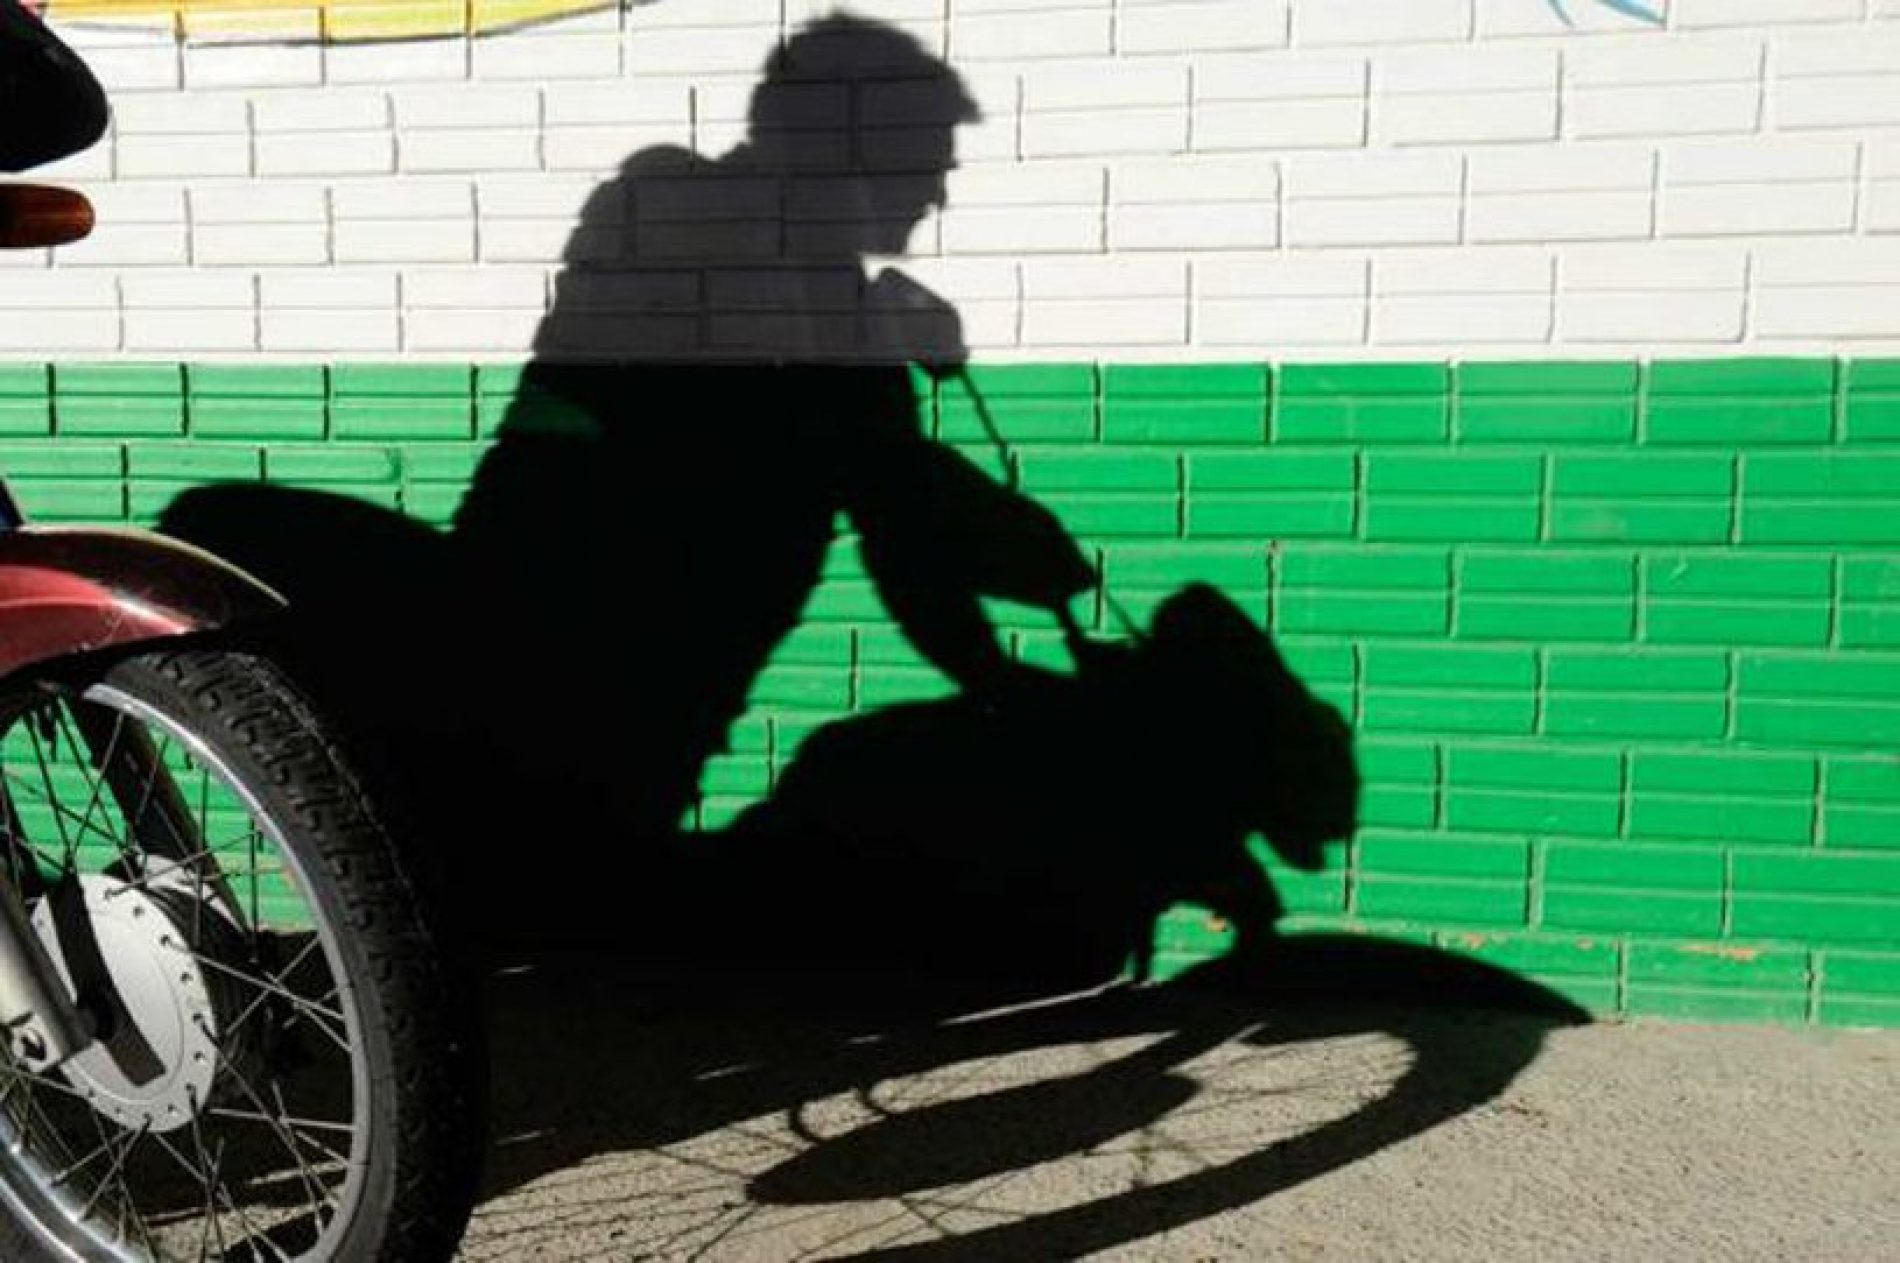 Furto de motocicleta no bairro Oriente